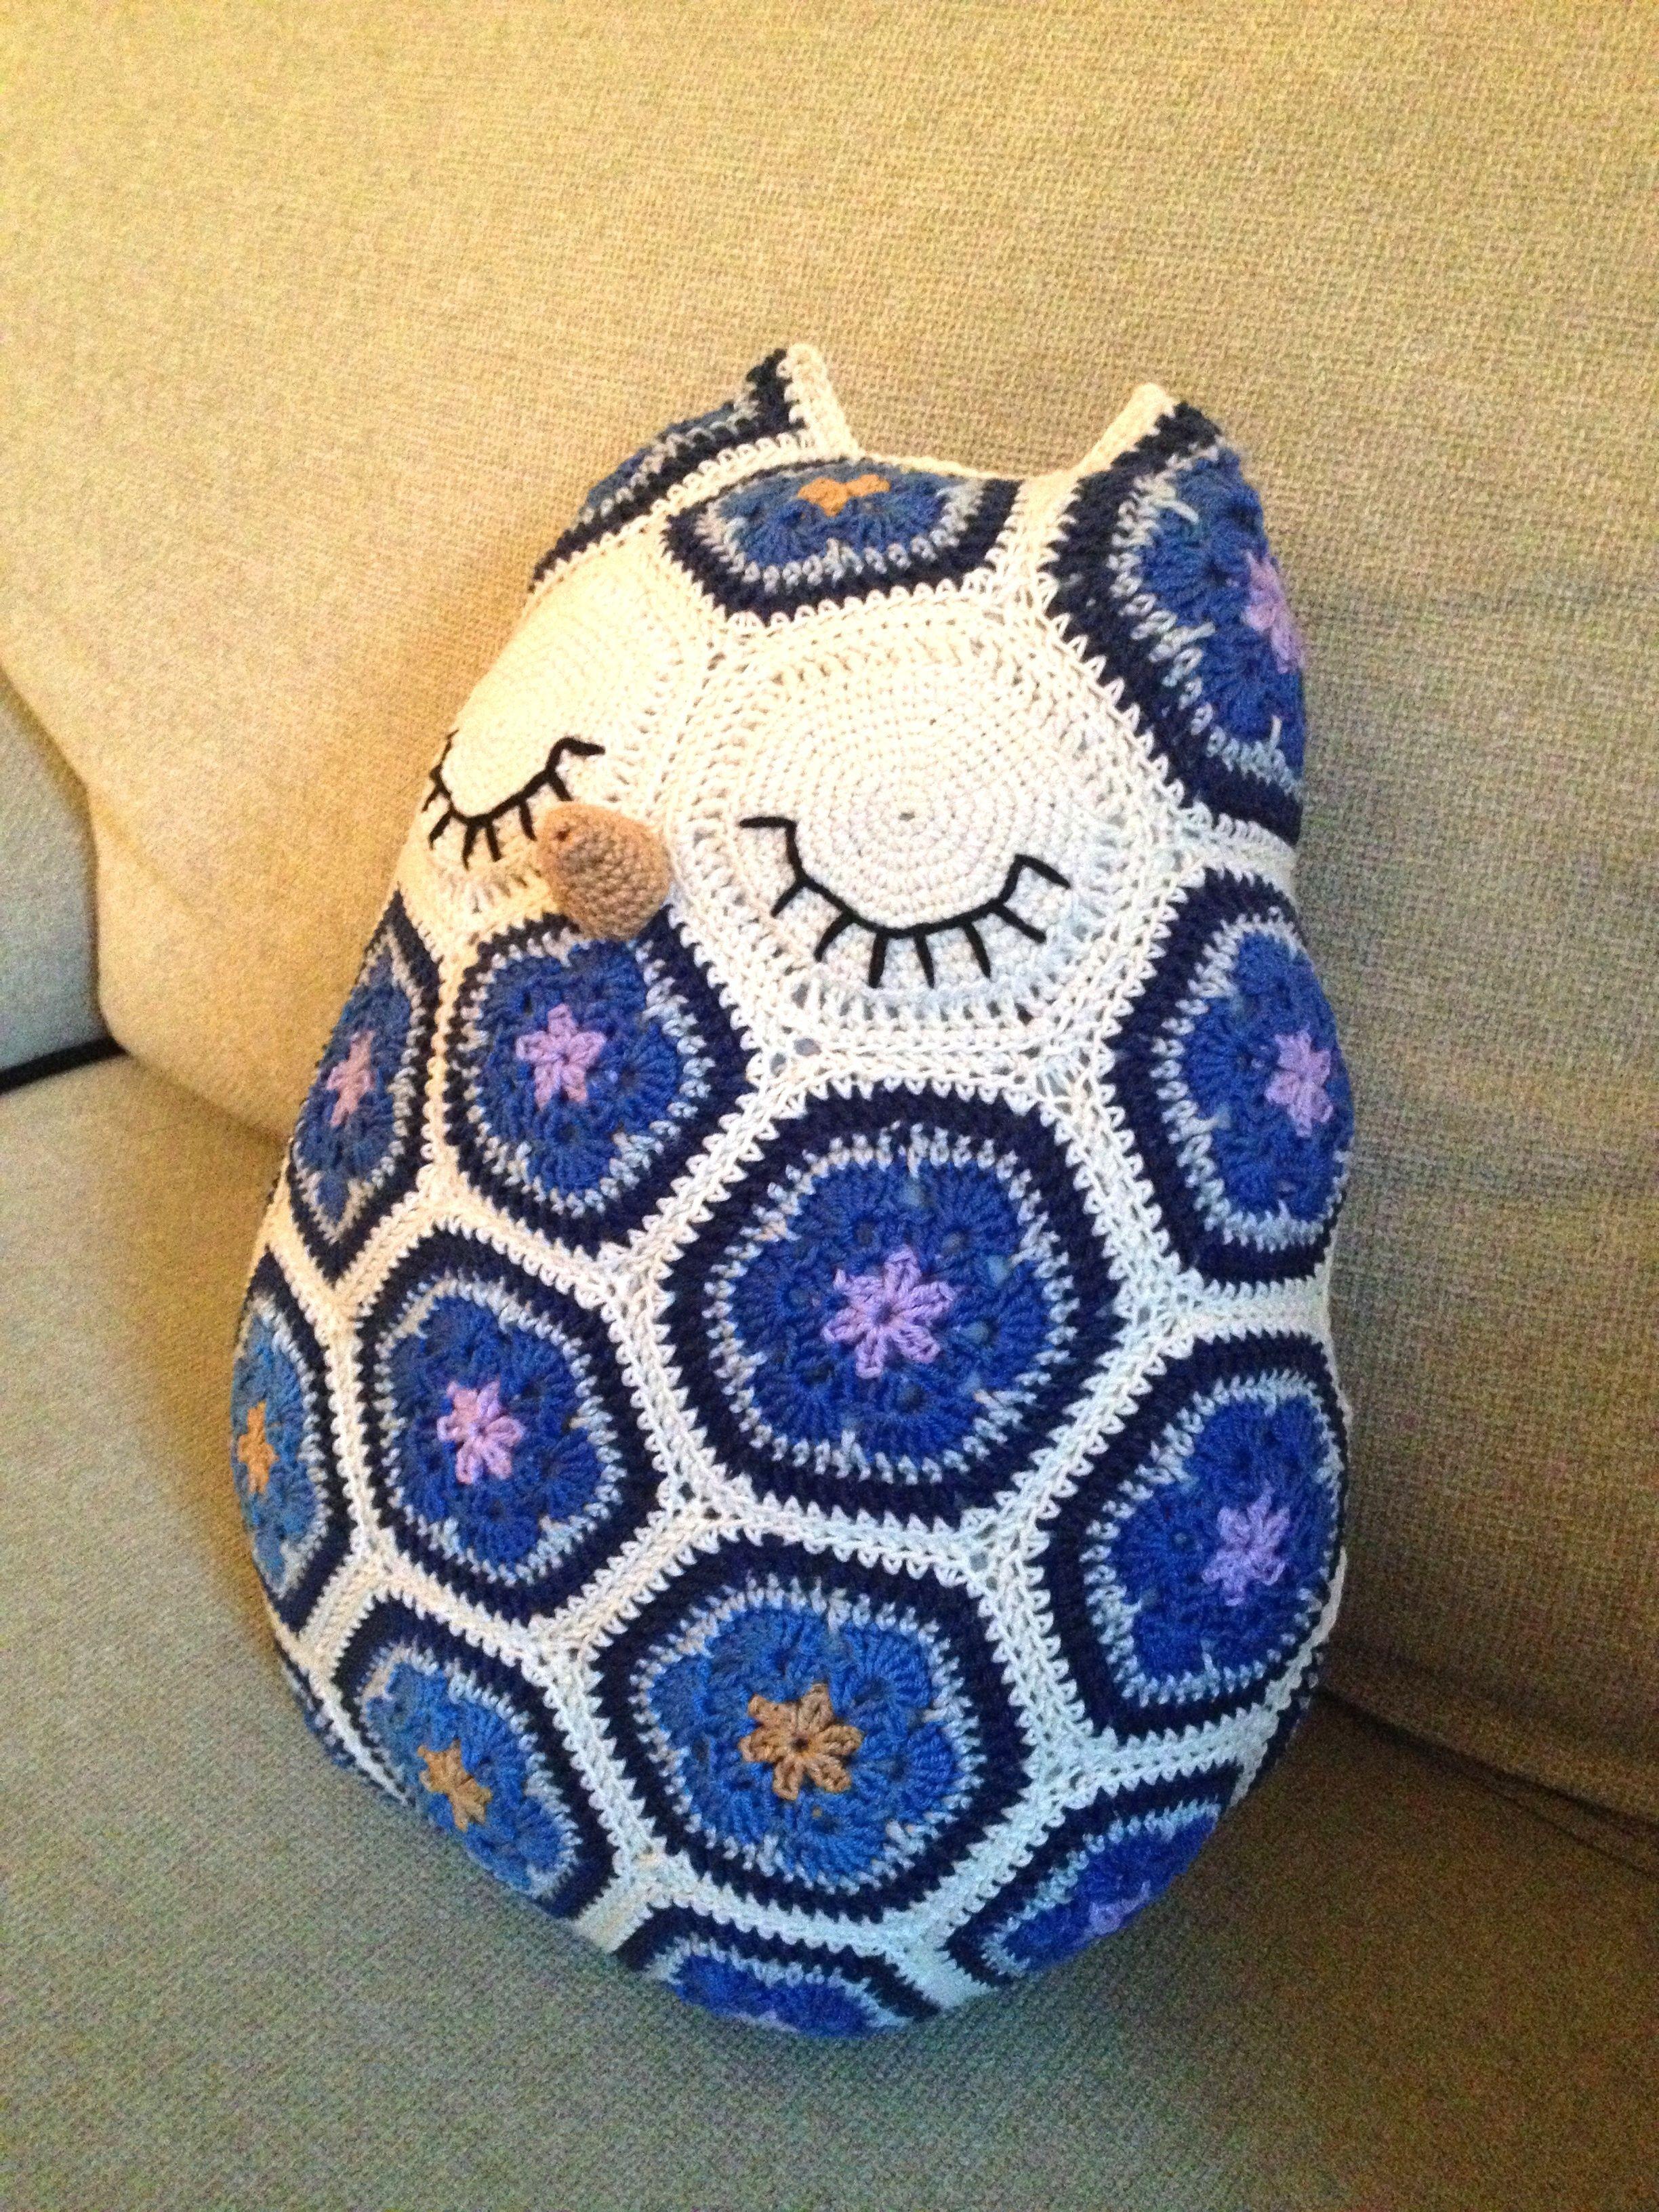 Sackboy Papercraft Crochet African Flower Owl Free Pattern Dancox for